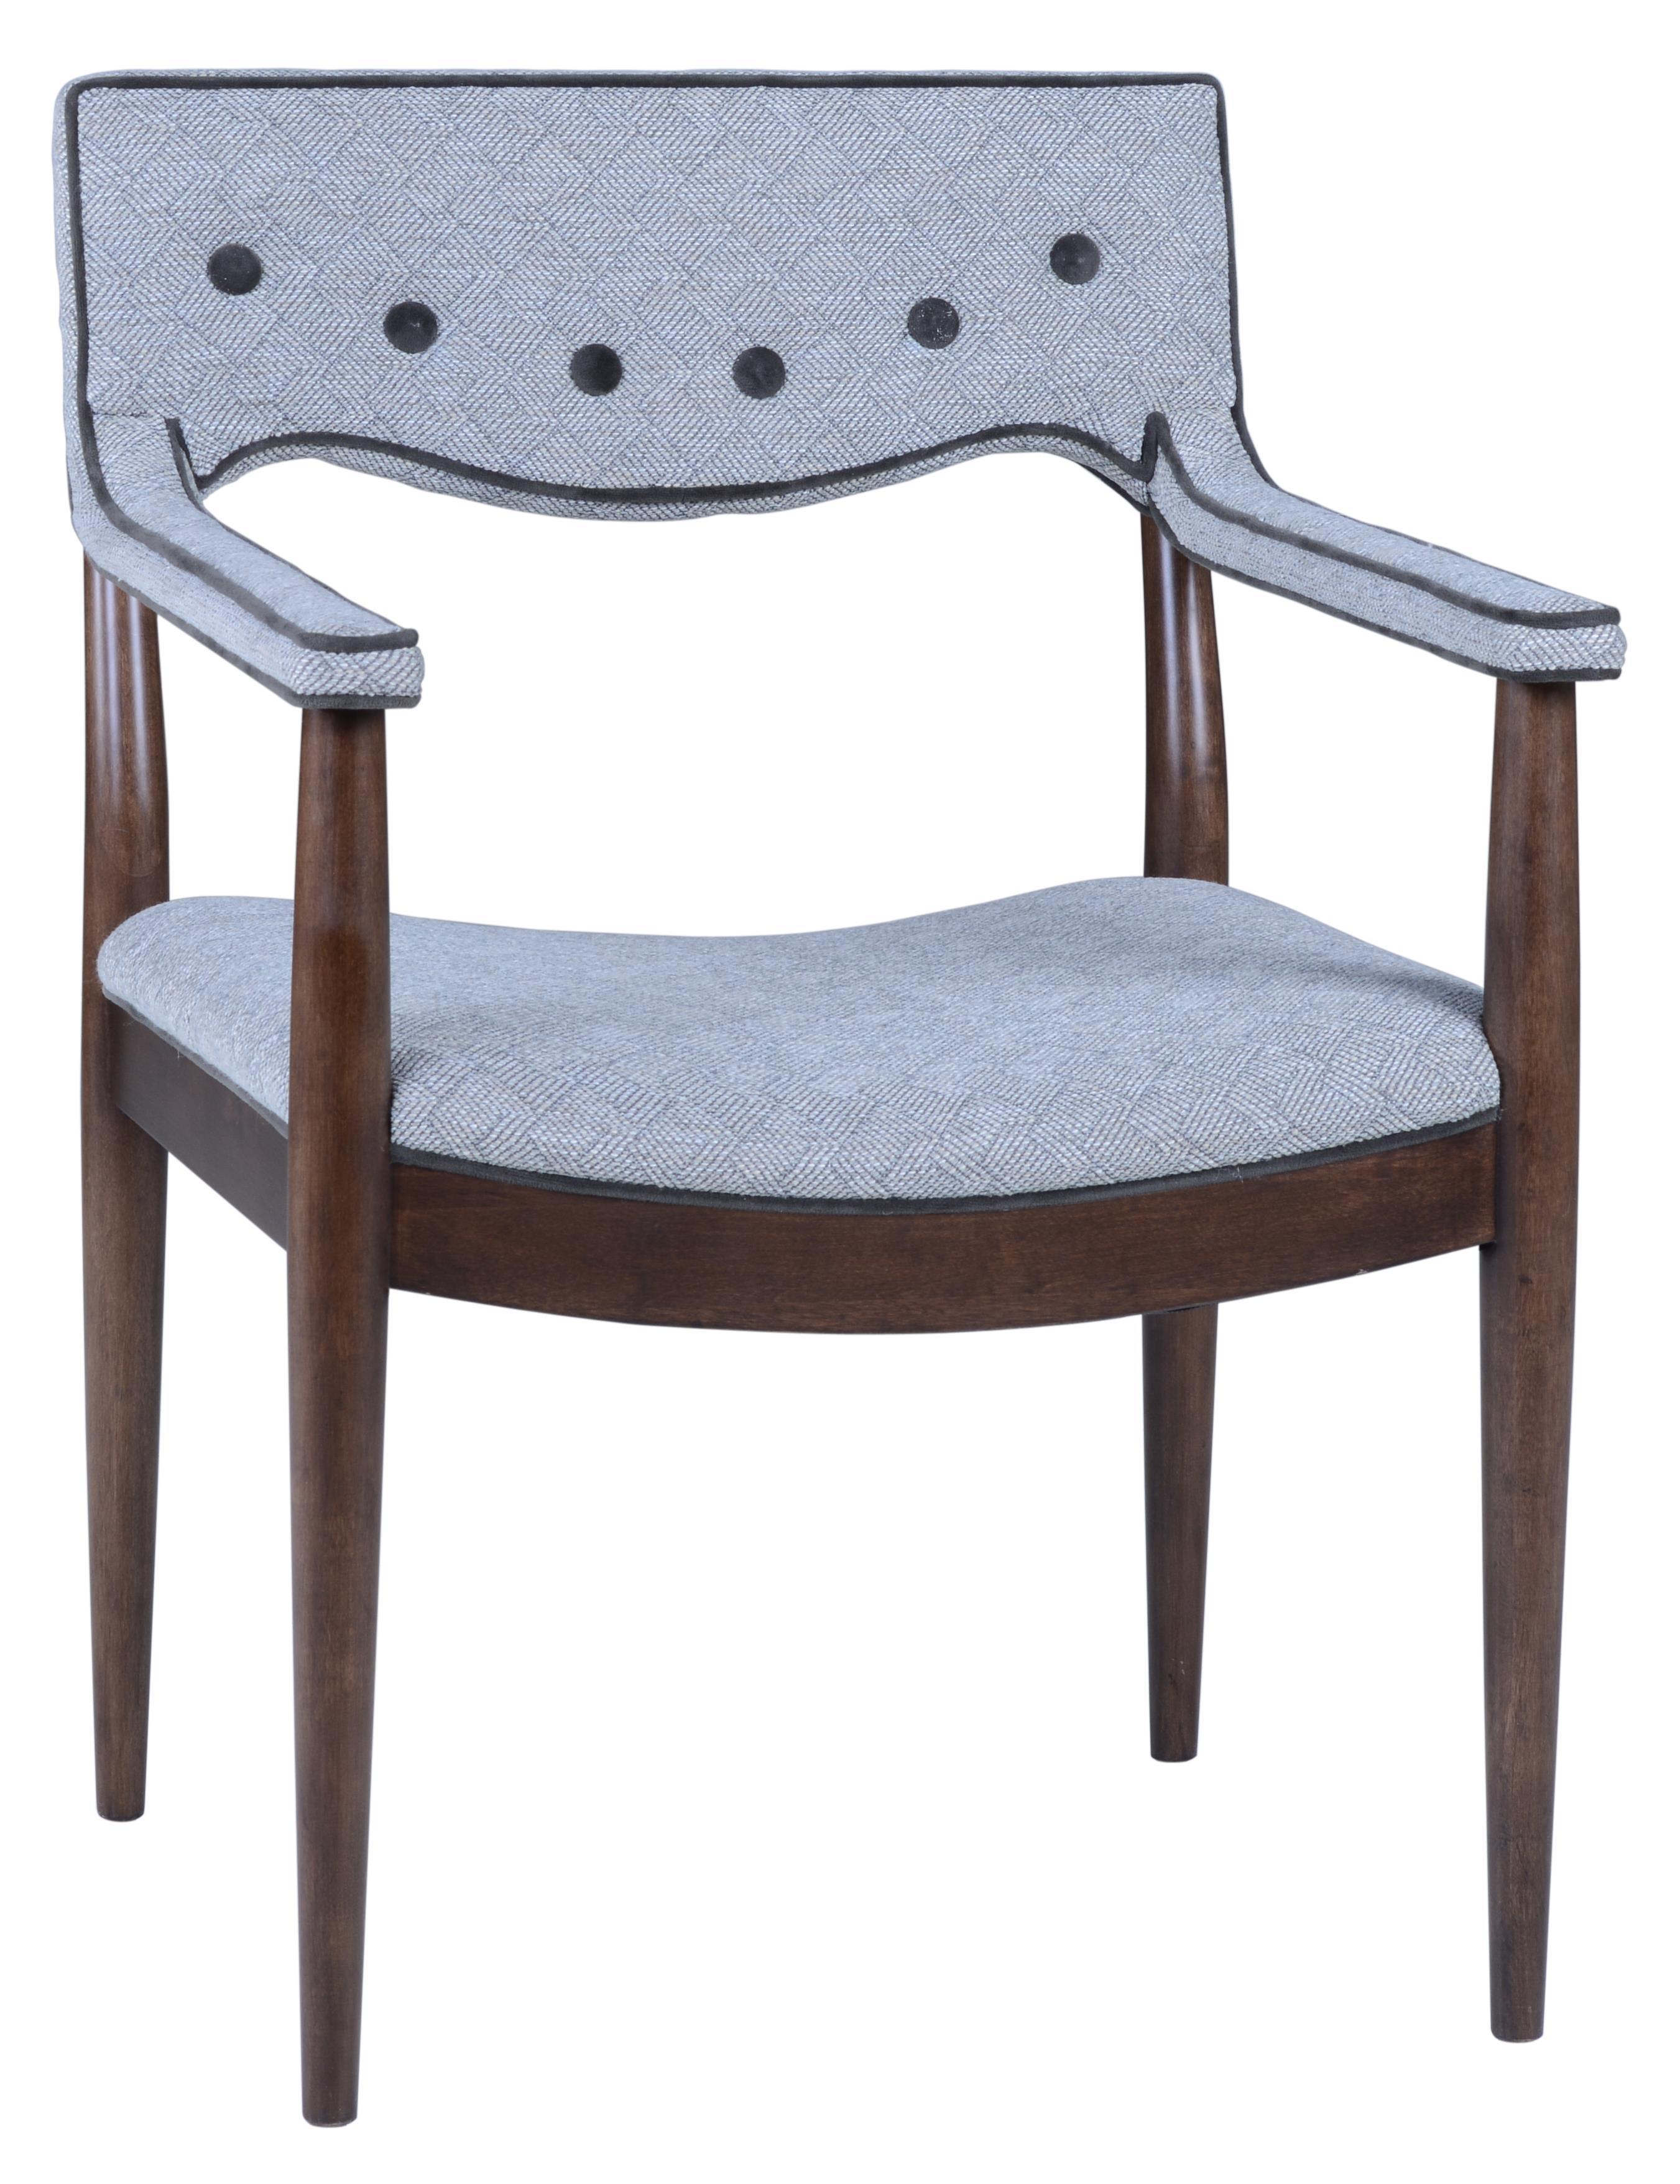 Belfort Signature Urban Treasures 14th and U Upholstered Arm Chair - Item Number: 223201-1812